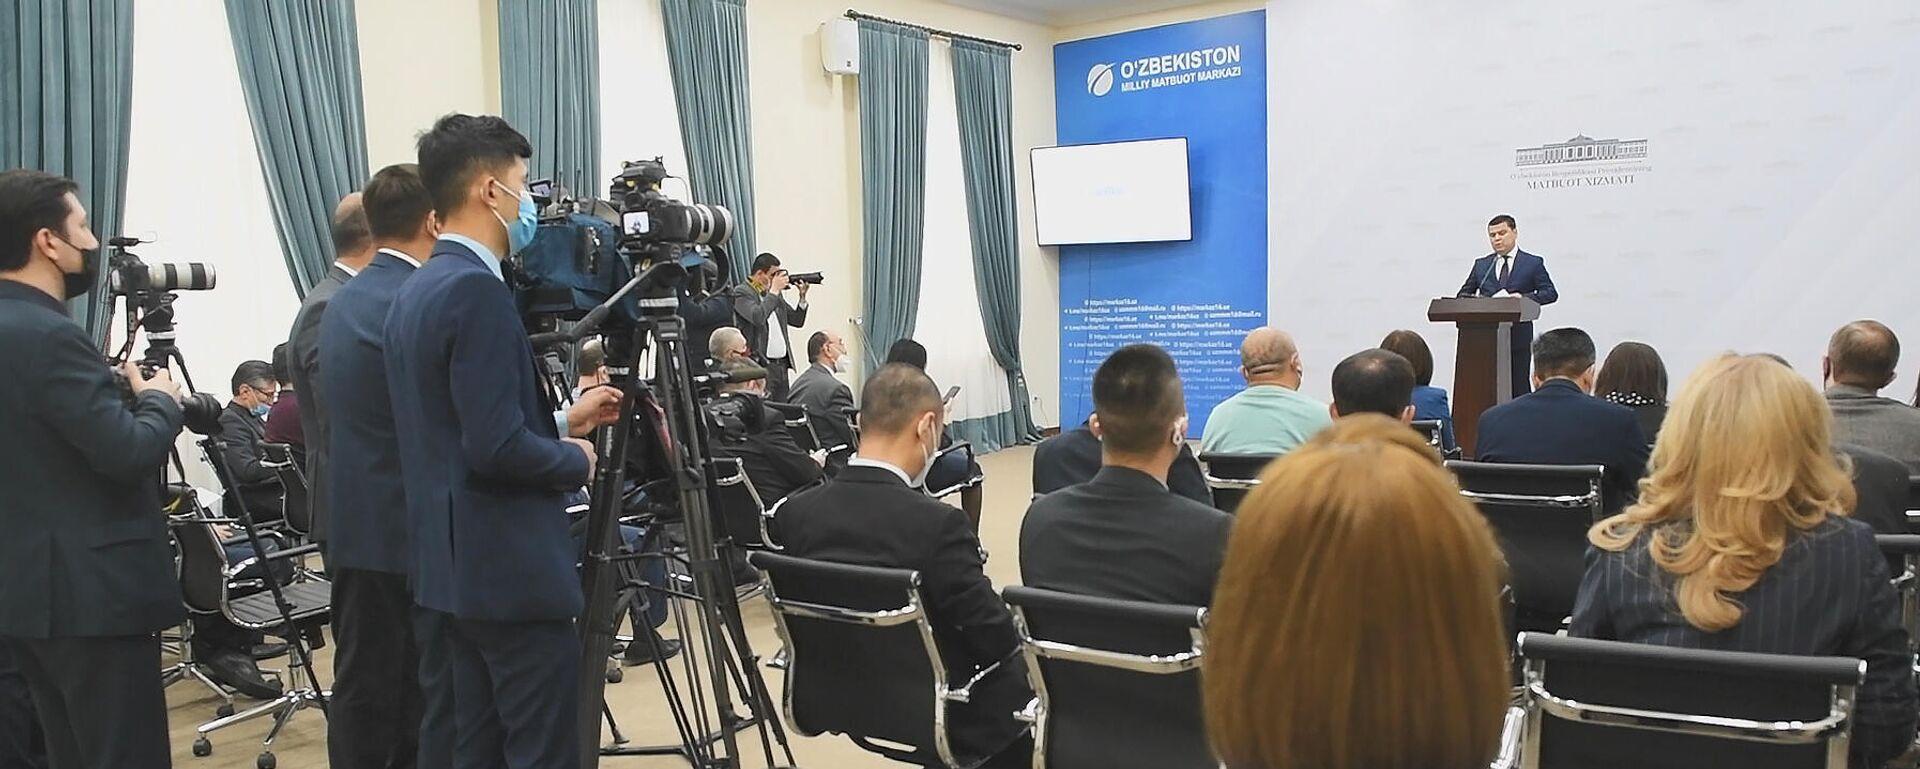 Брифинг с участием пресс-секретаря президента Узбекистана Шерзодом Асадовым - Sputnik Узбекистан, 1920, 29.03.2021